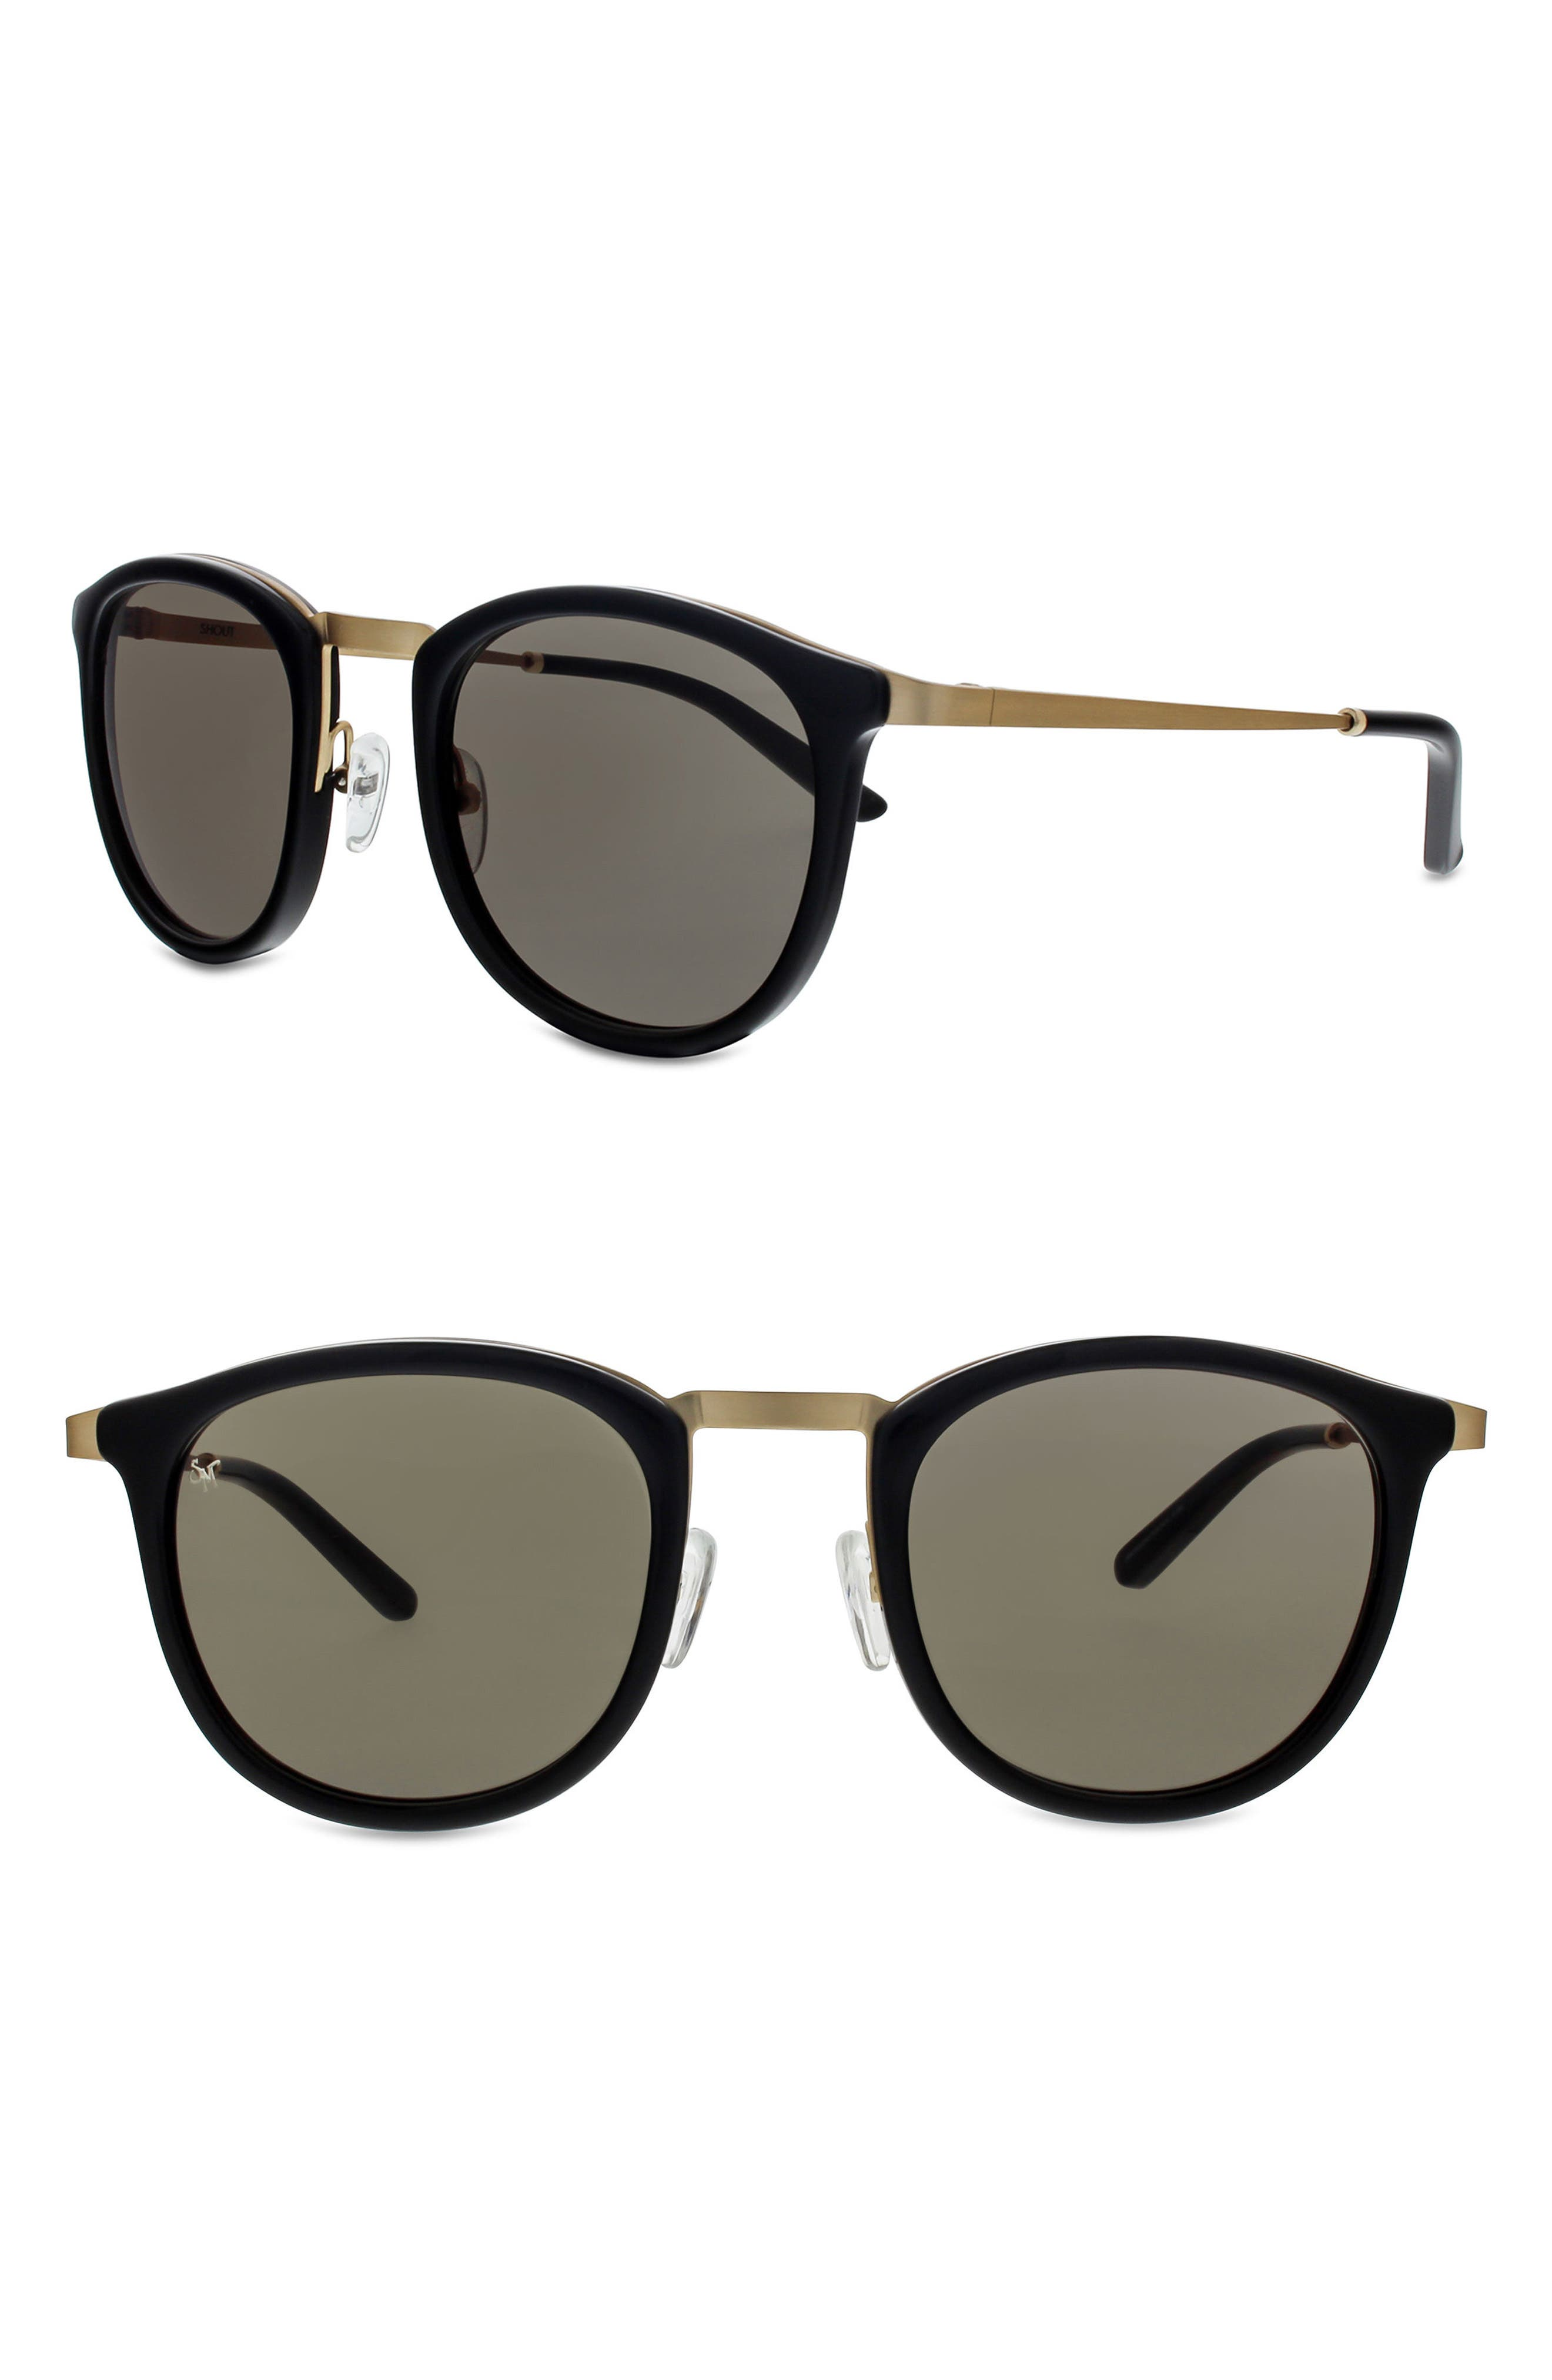 Main Image - SMOKE X MIRRORS Shout 49mm Retro Sunglasses